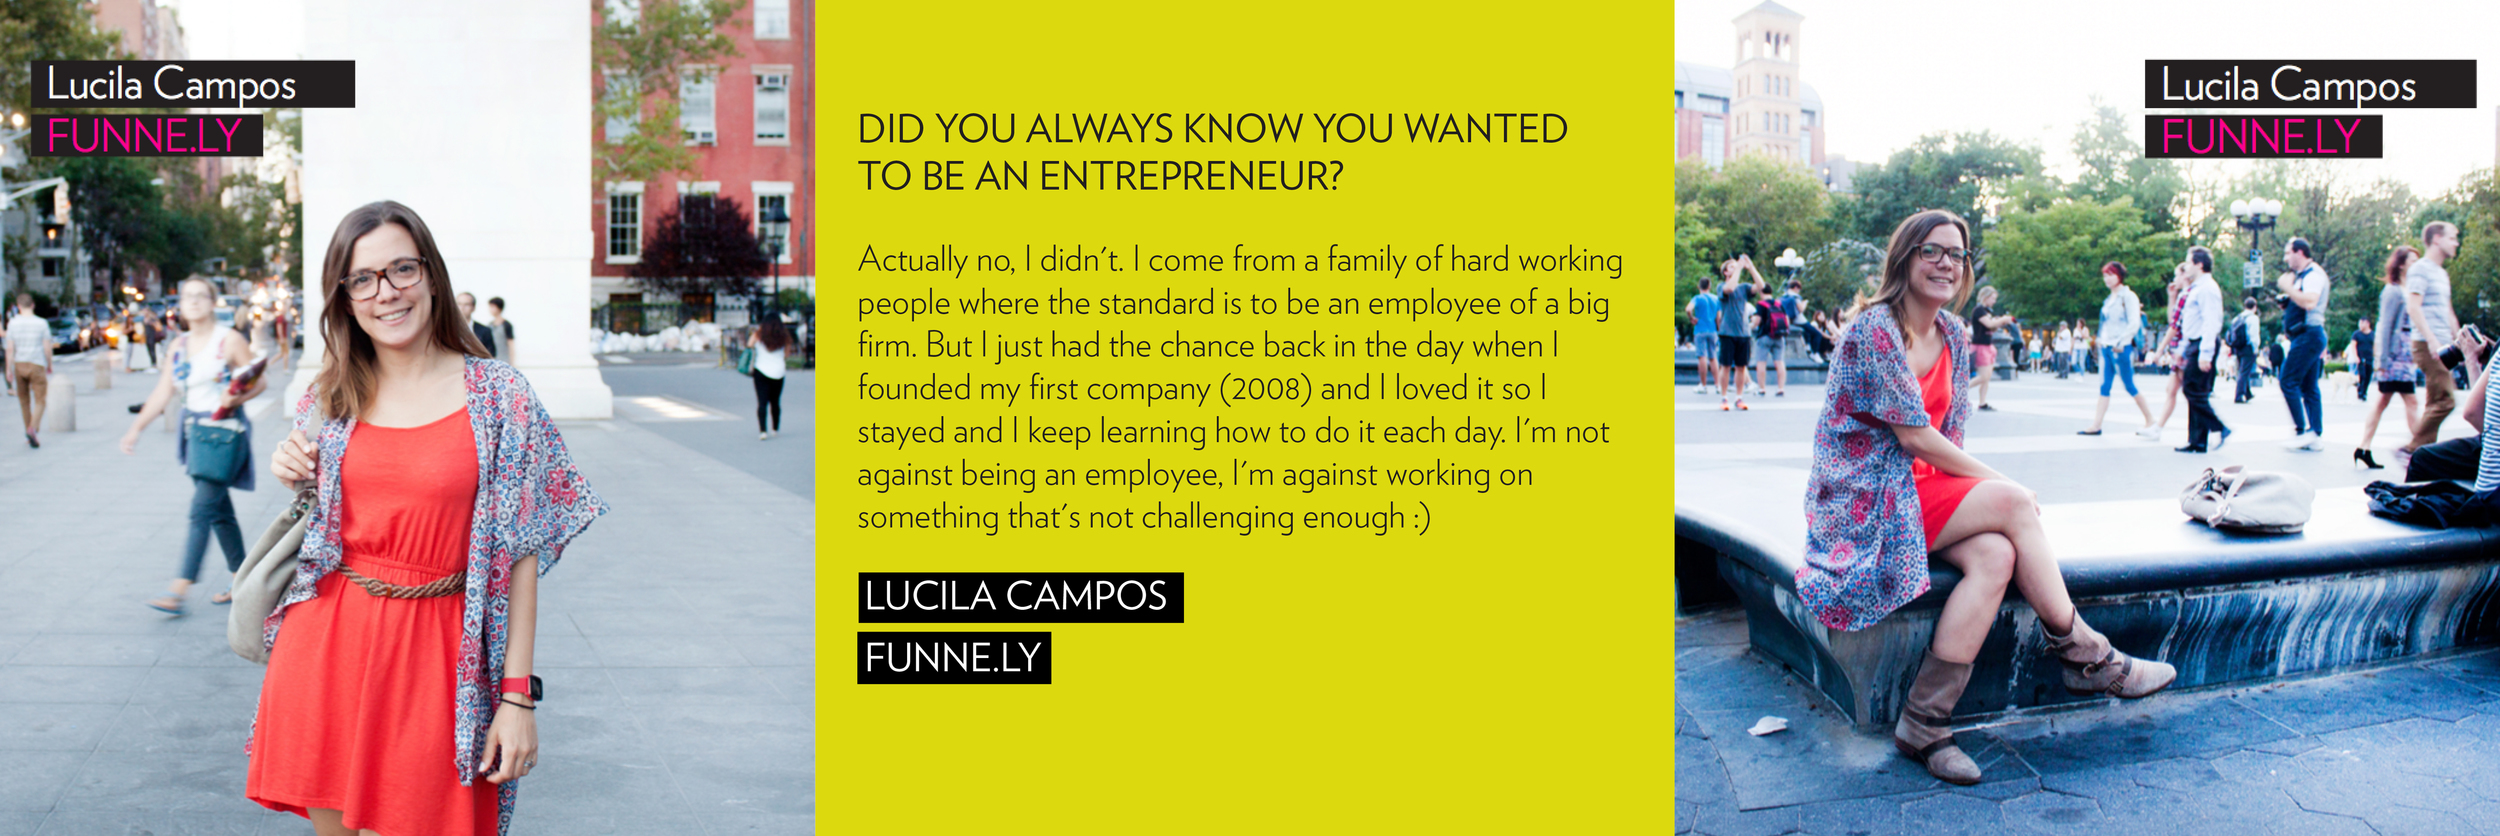 lucila campos business entrepreneurship entrepreneur boss women boss inspire empower nyc werule we rule success role model